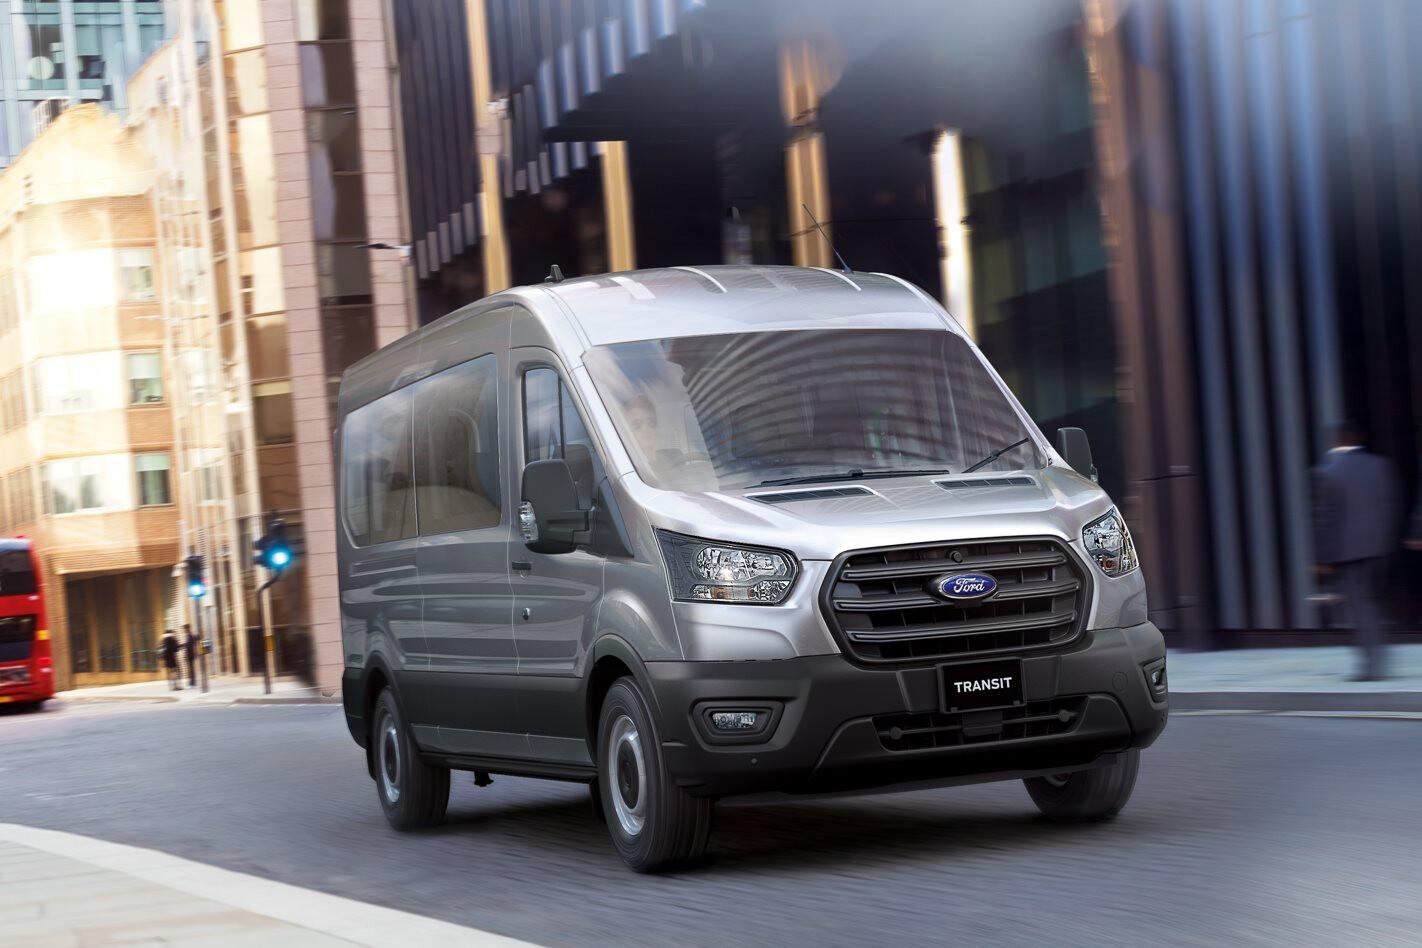 01 2021 Ford Transit 410 Bus 2 Jpg